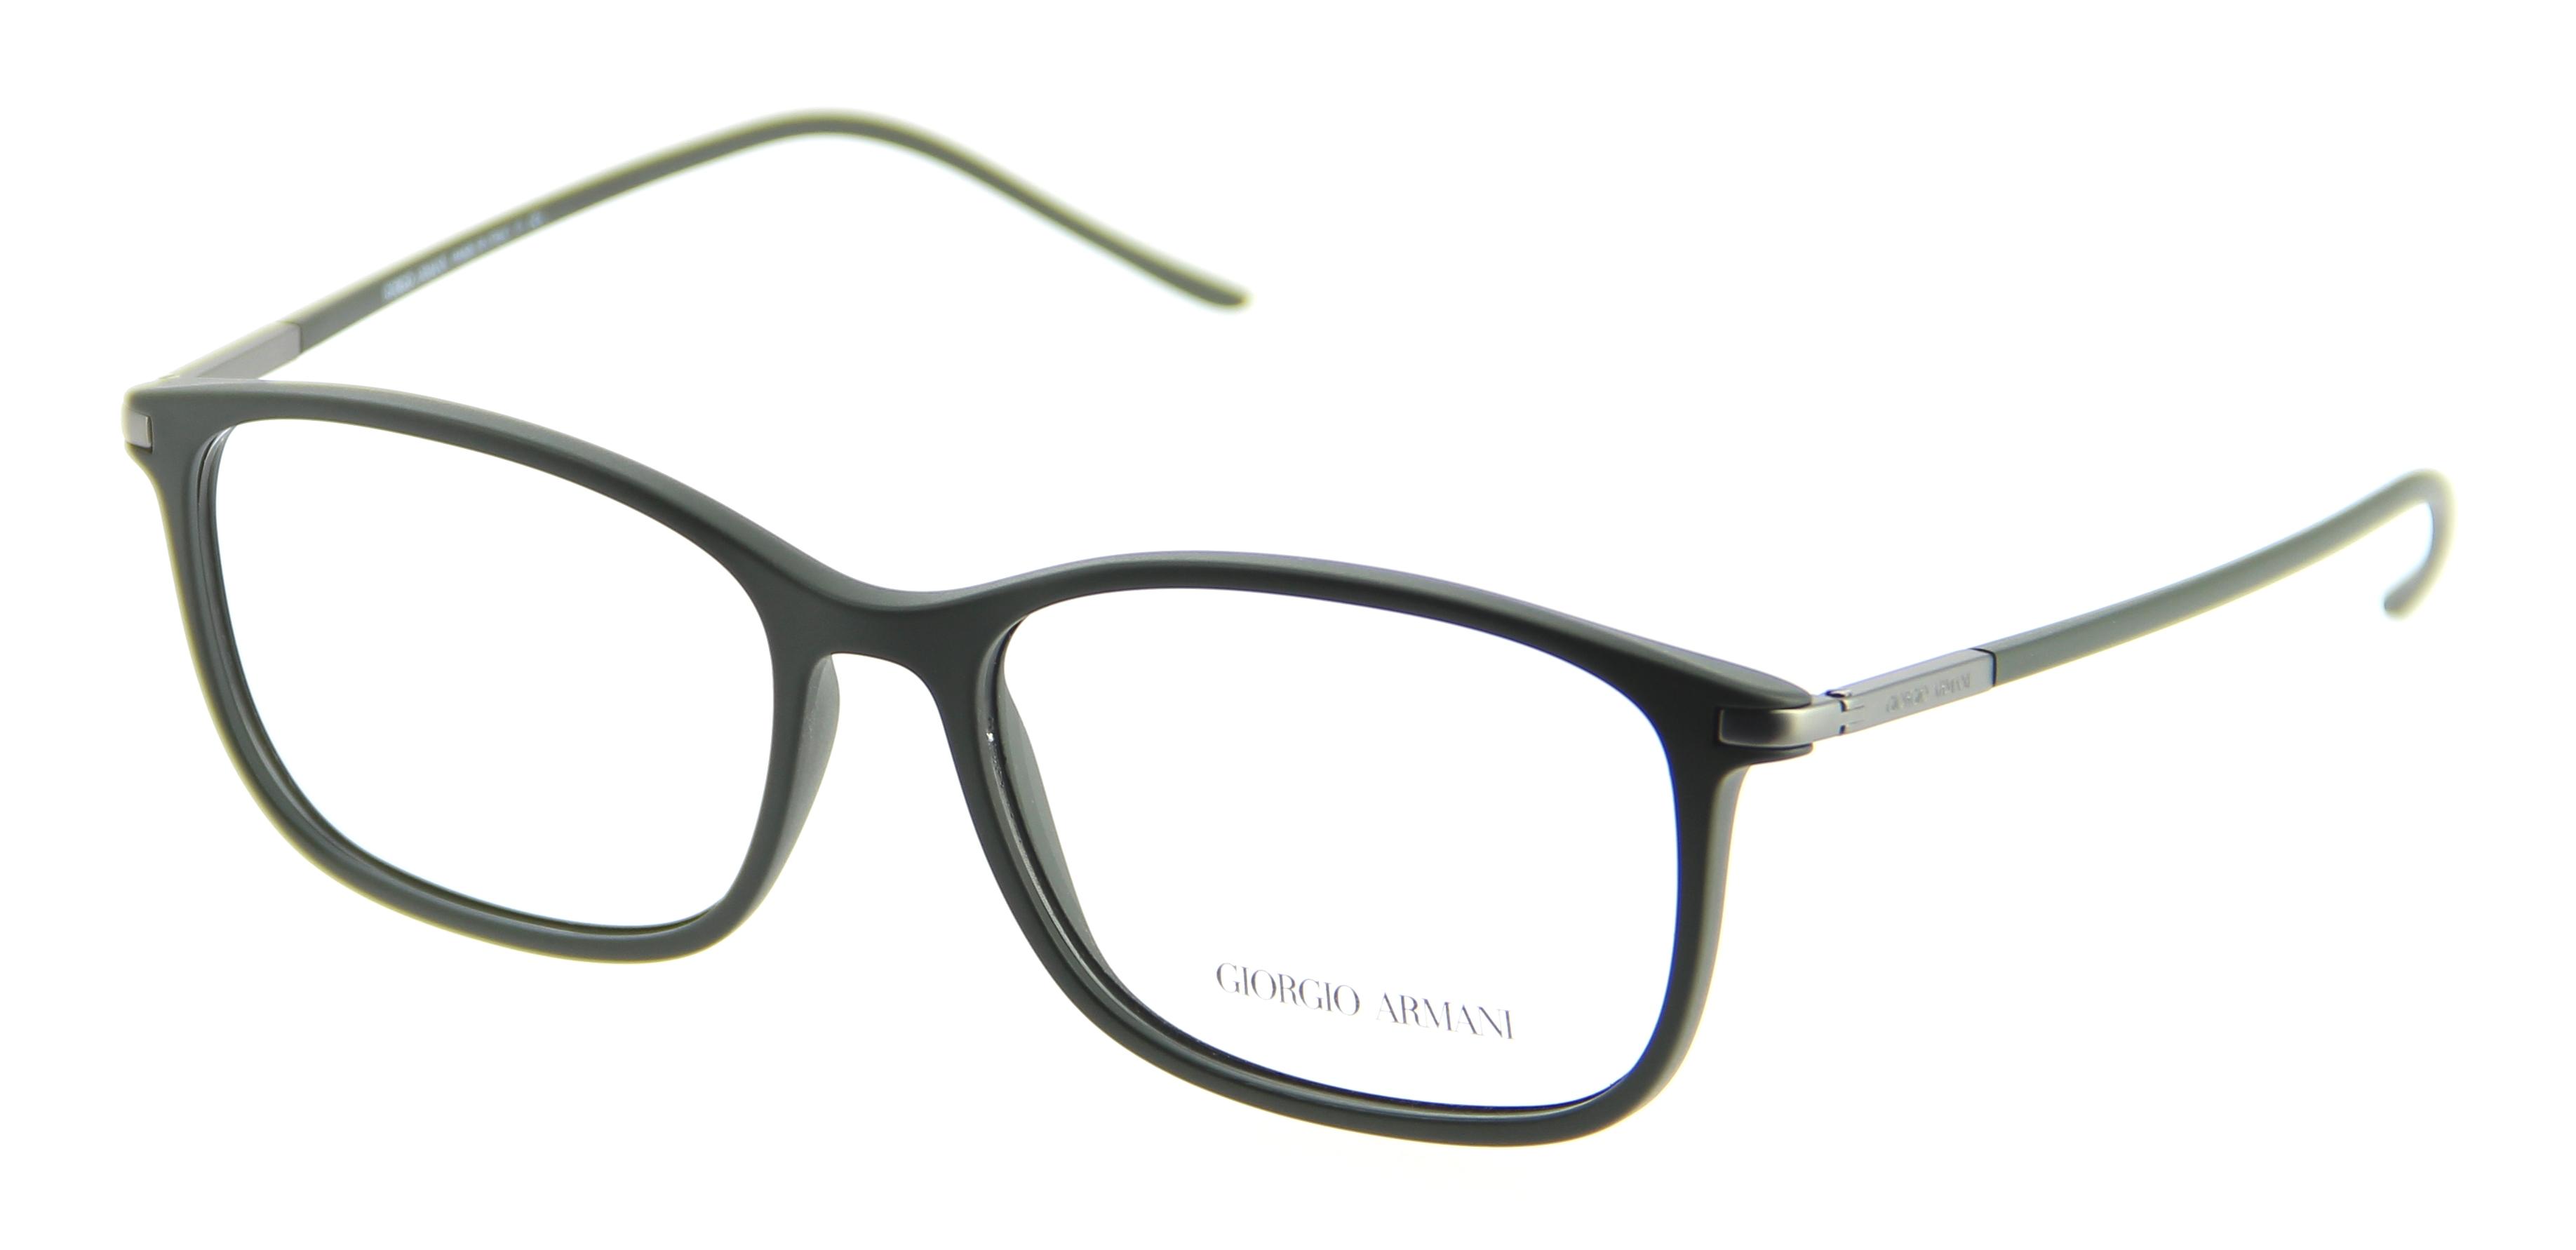 Armani Glasses Frames 2015 : Eyeglasses GIORGIO ARMANI AR 7006 5152 54/16 Man Vert ...